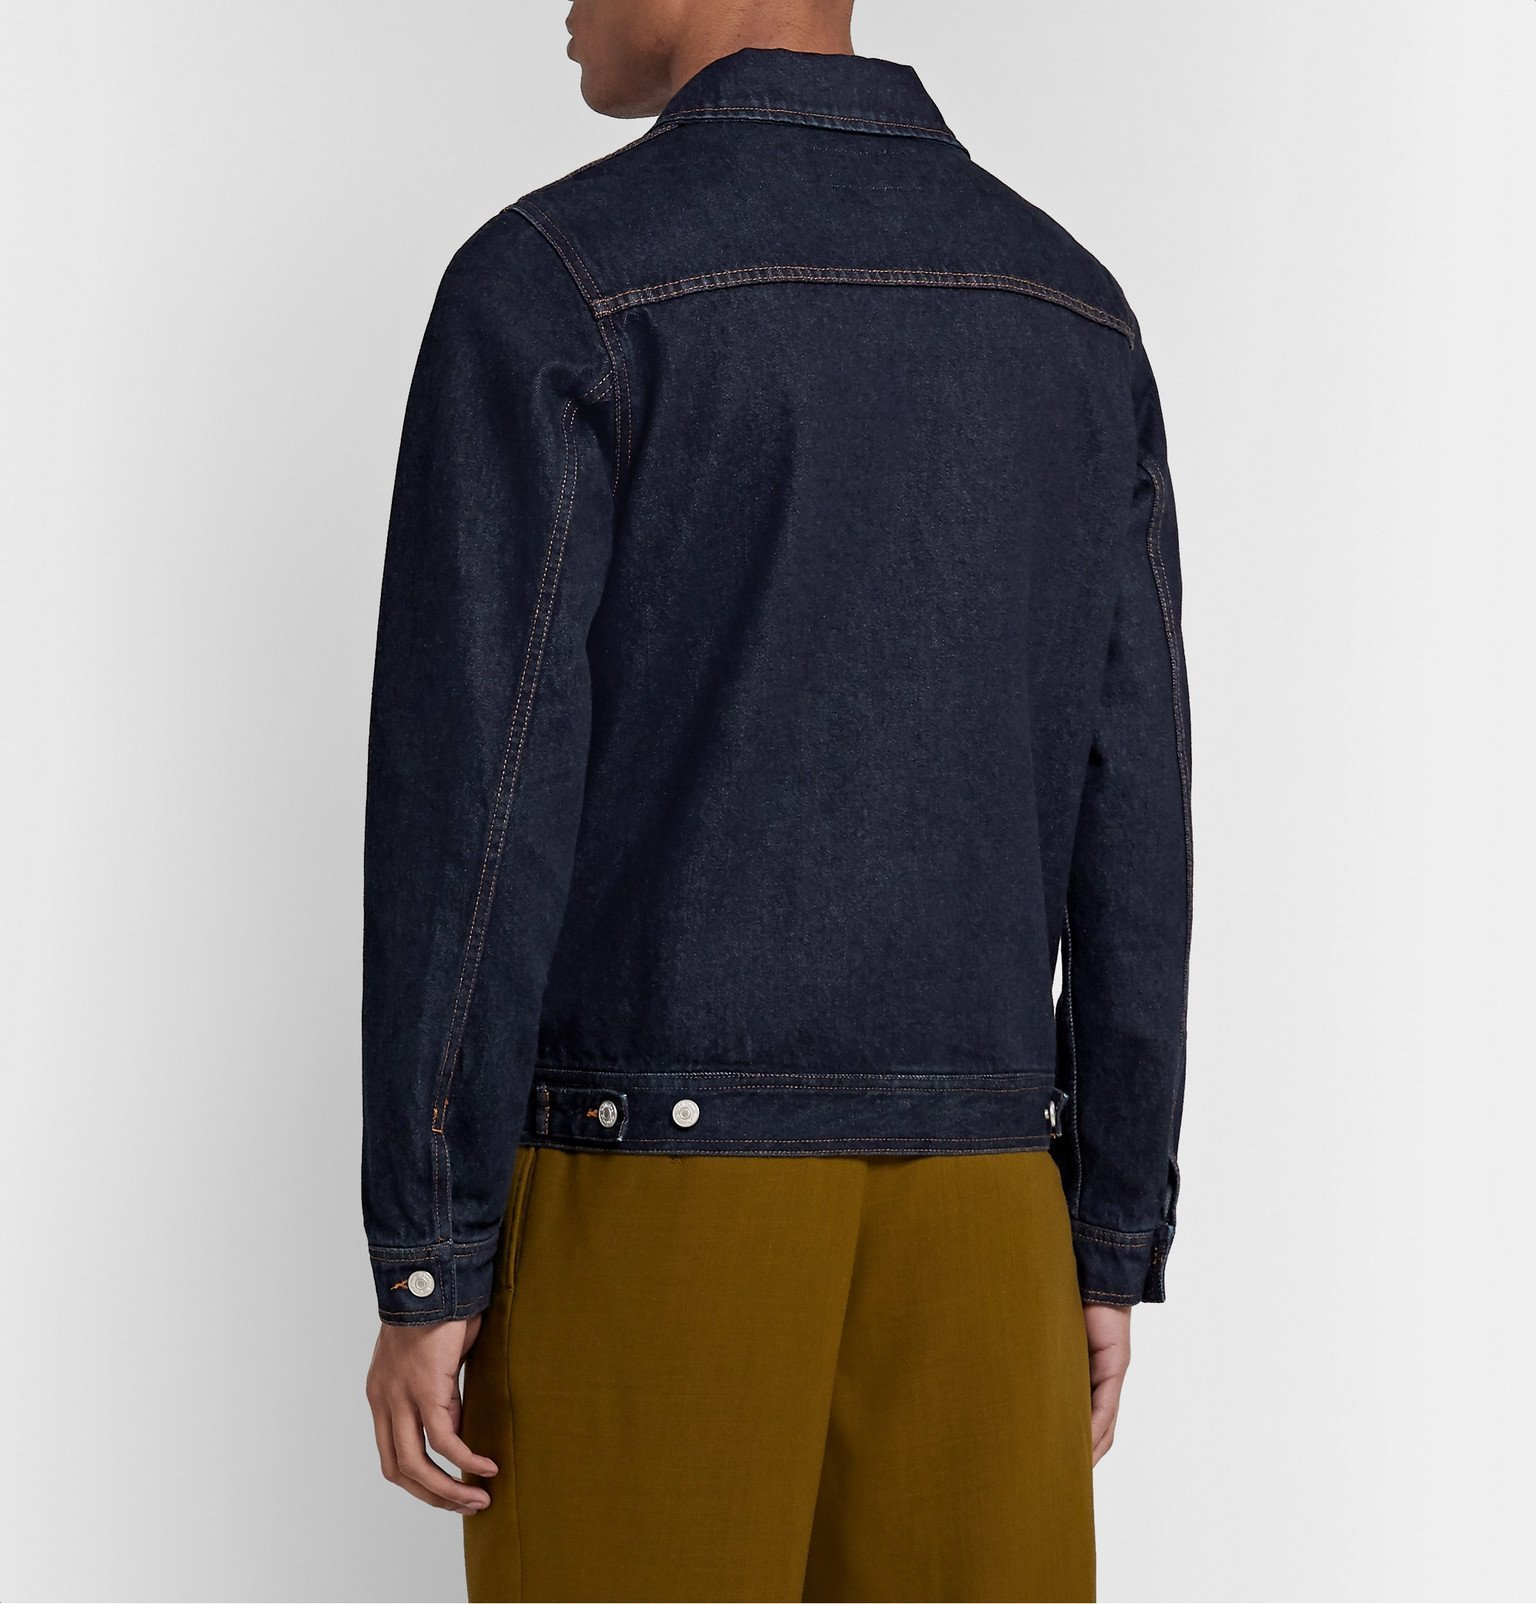 Officine Generale - Liam Raw Denim Jacket - Blue